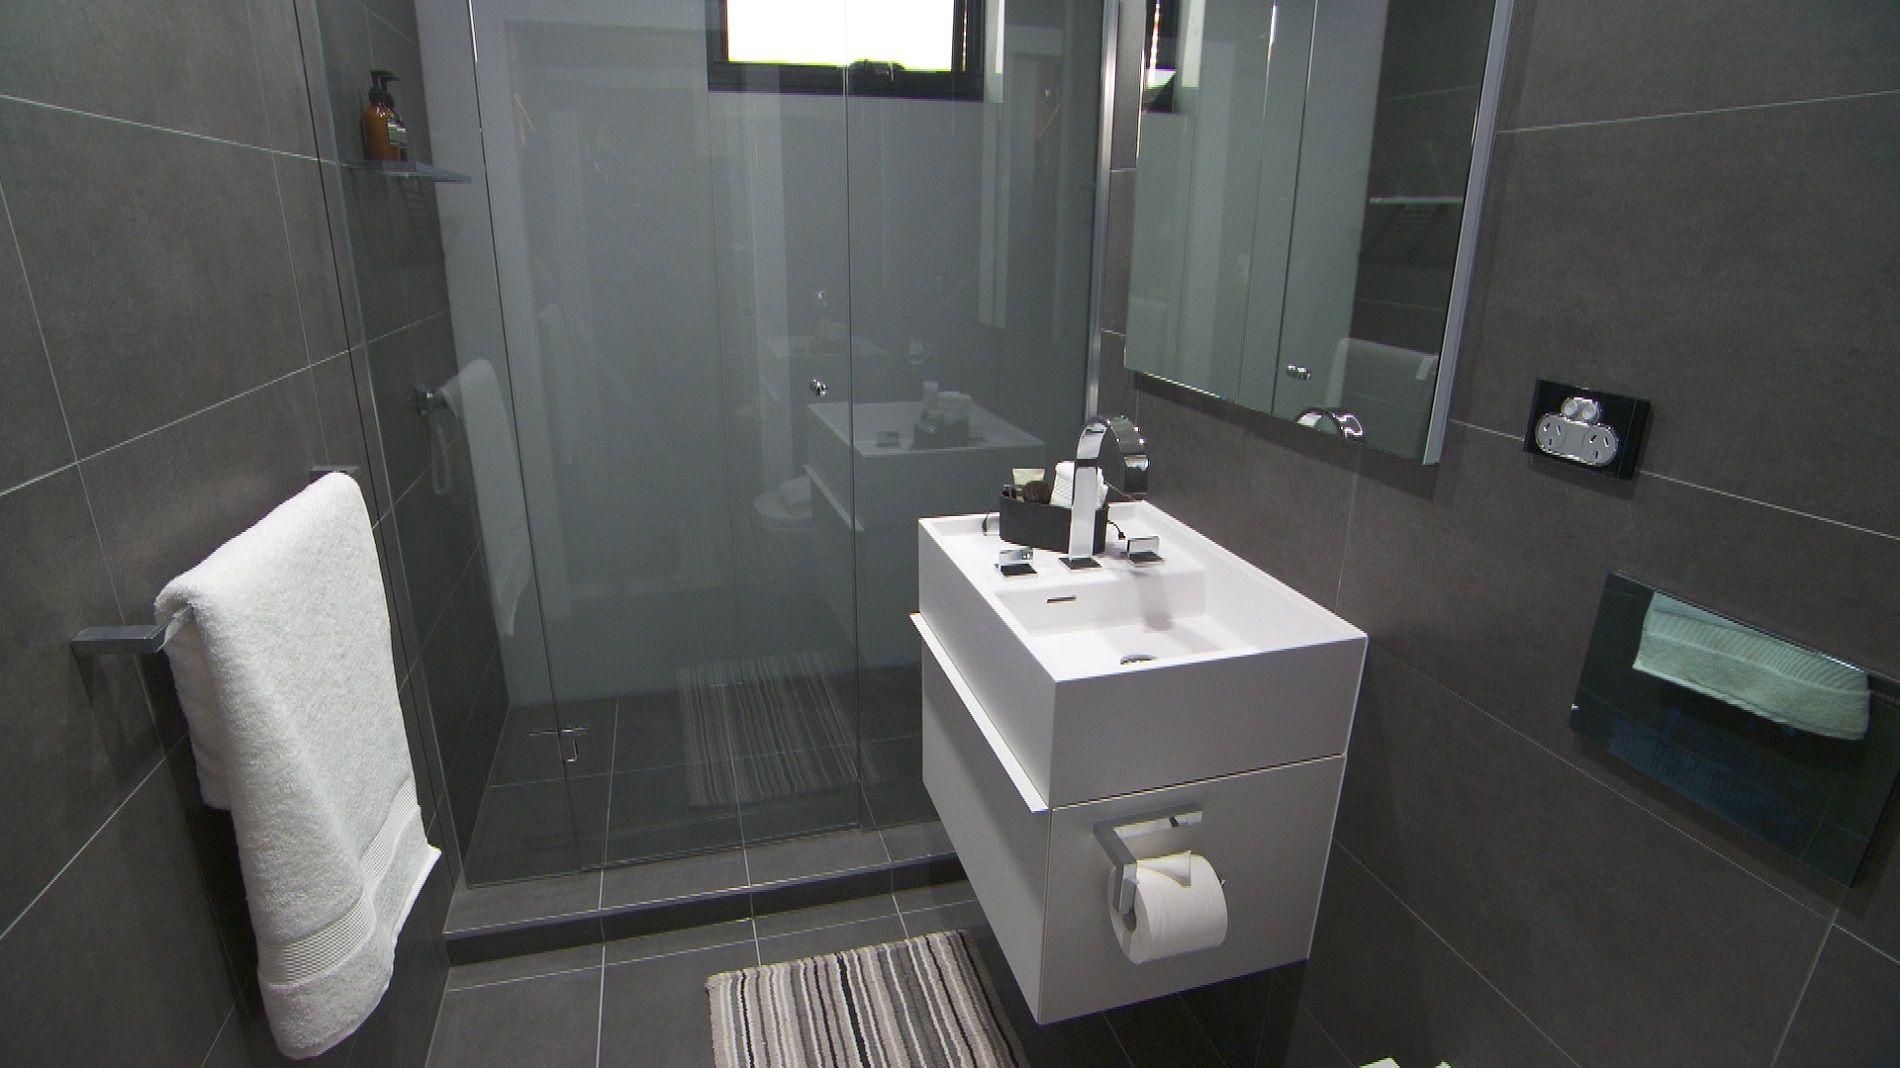 Tags rustic bathroom natural minimal monochrome - Bec George His Bathroom Challenge 3 Wall Floor Belgium Stone